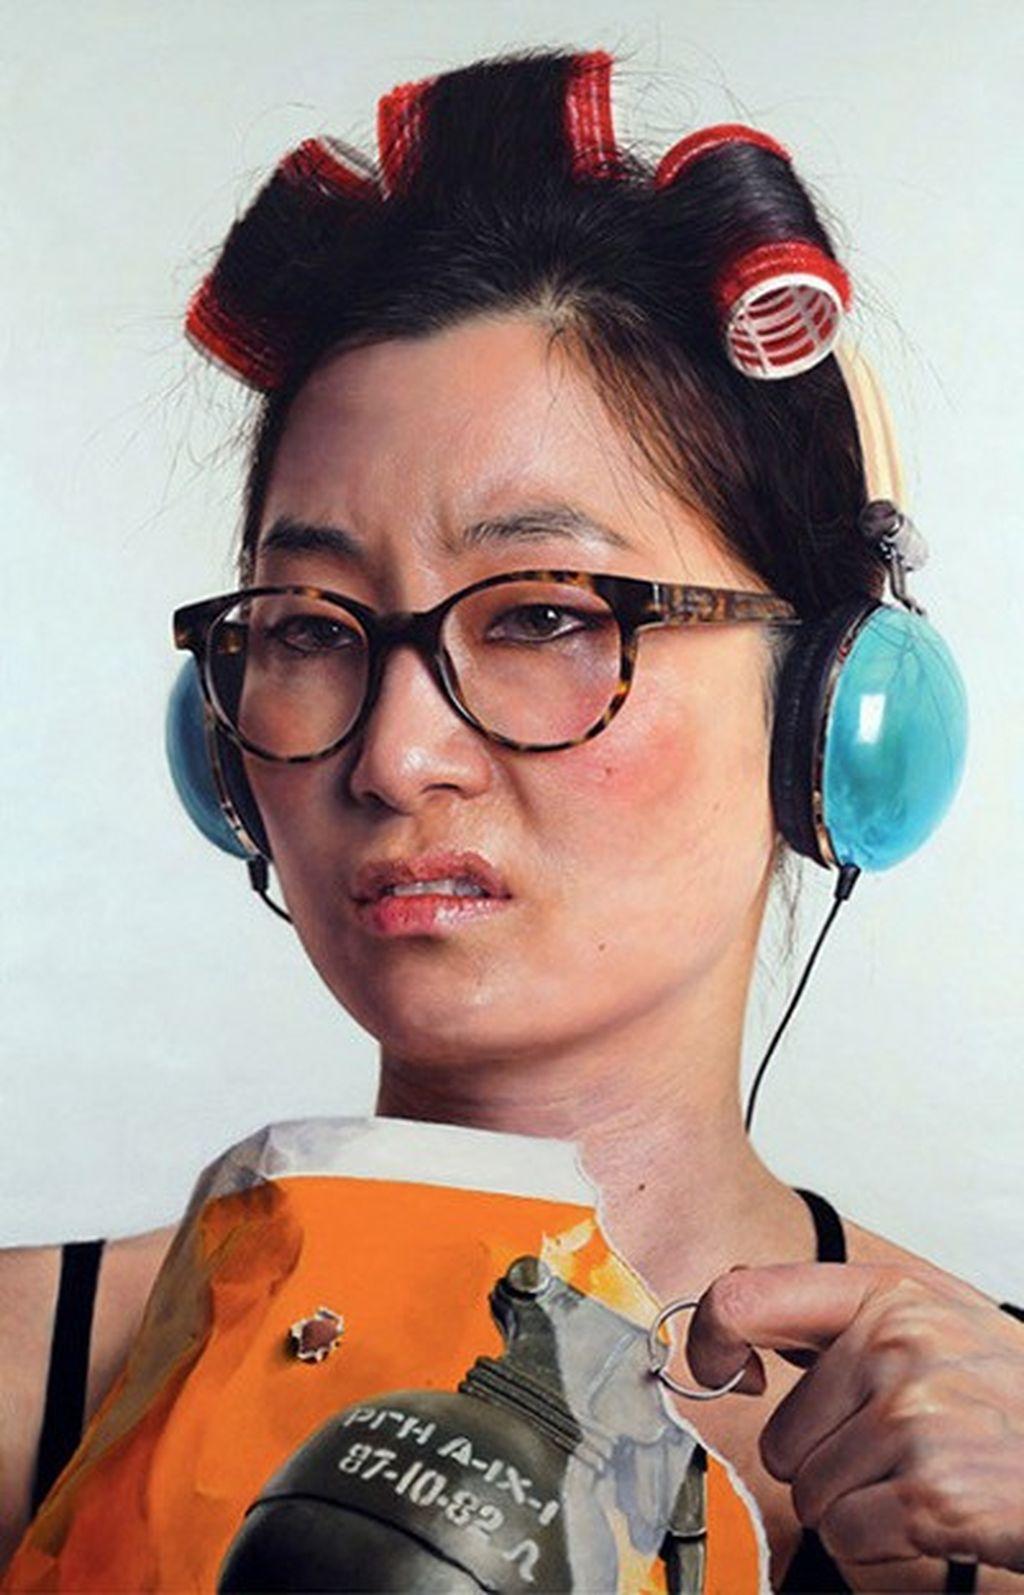 Dia adalah Kang Kang Hoon, seorang seniman lukis yang mengambil aliran hyperrealism sehingga sangat mirip kenyataan atau aslinya. Foto: Kang Kang Hoon